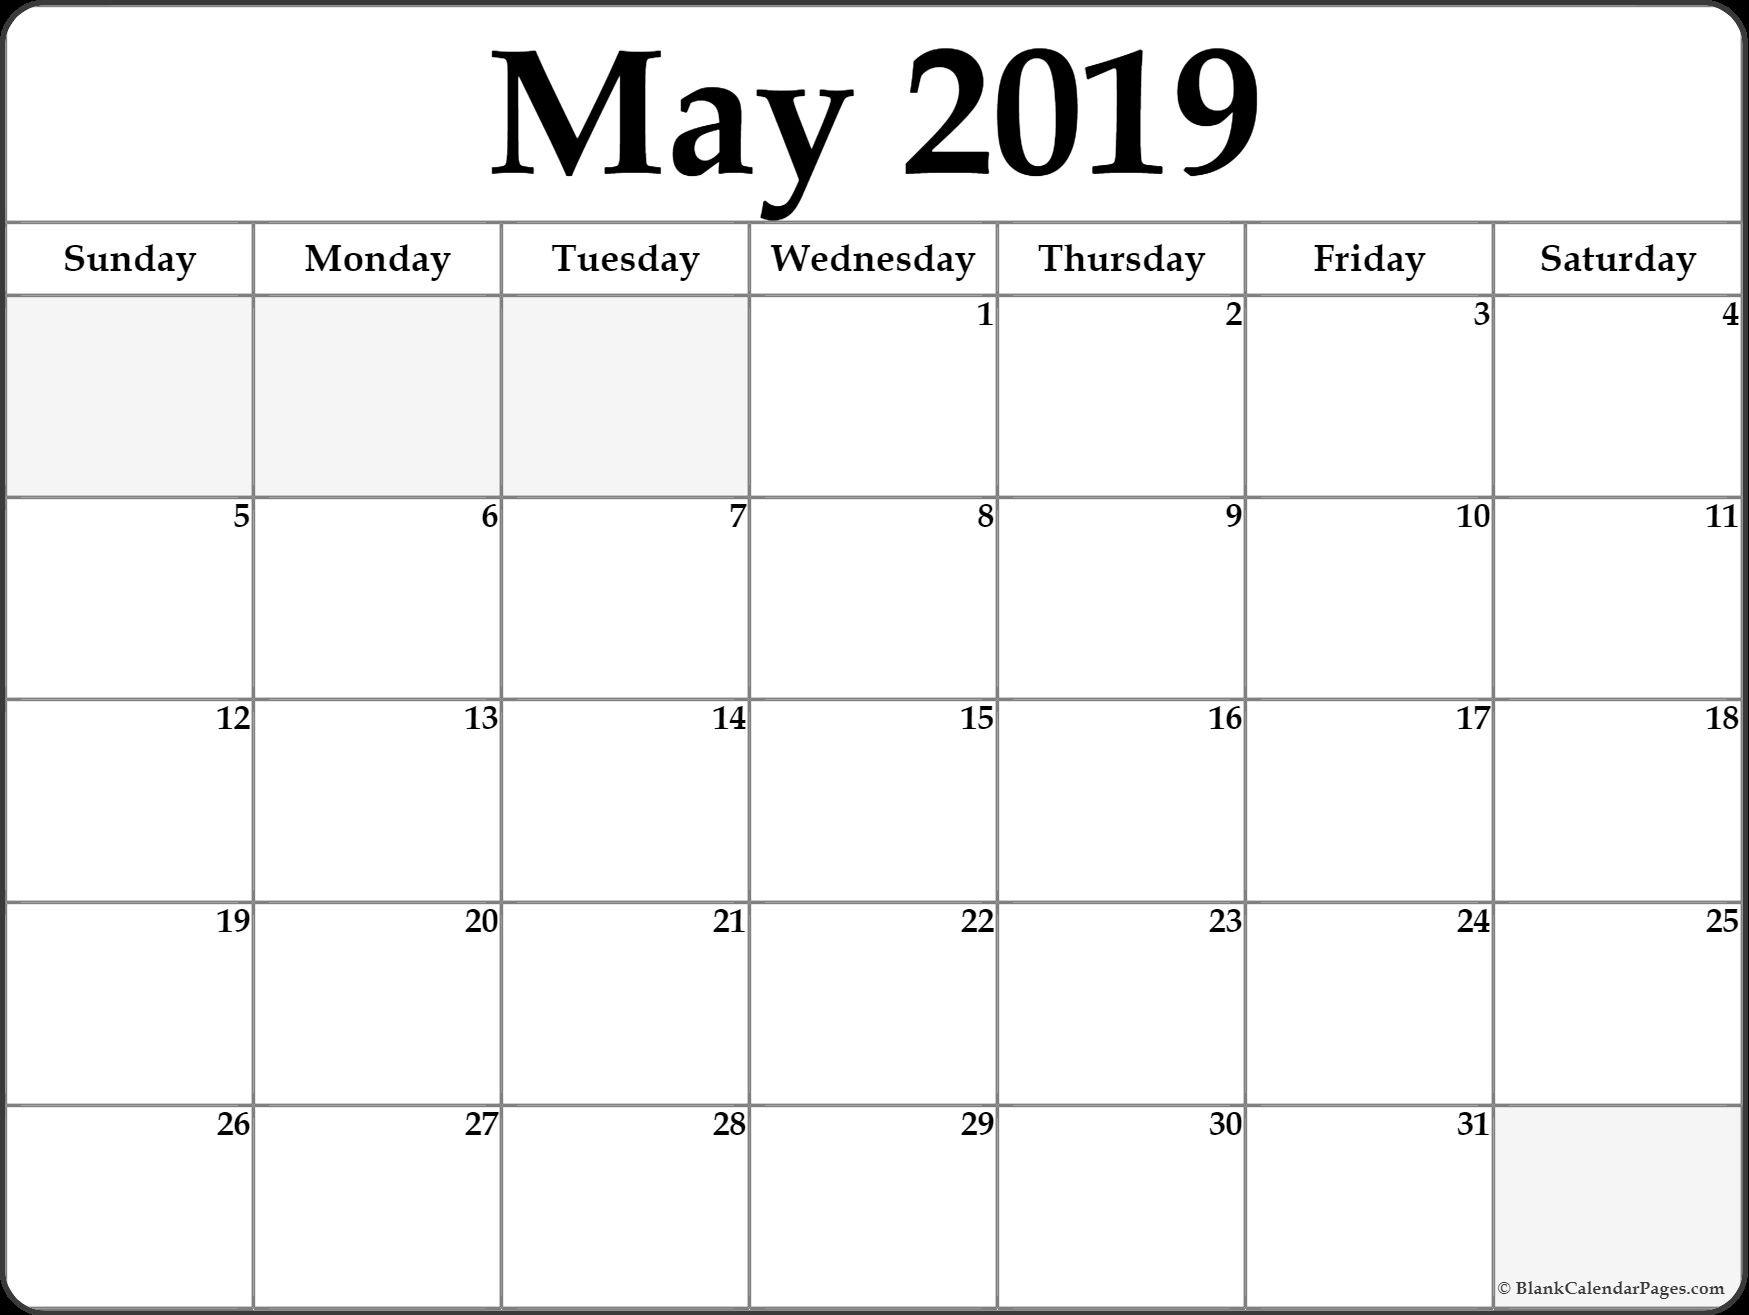 May 2019 Calendar Printable Template Site Provides Calendarmay 2019 Calendar 2019 Blank